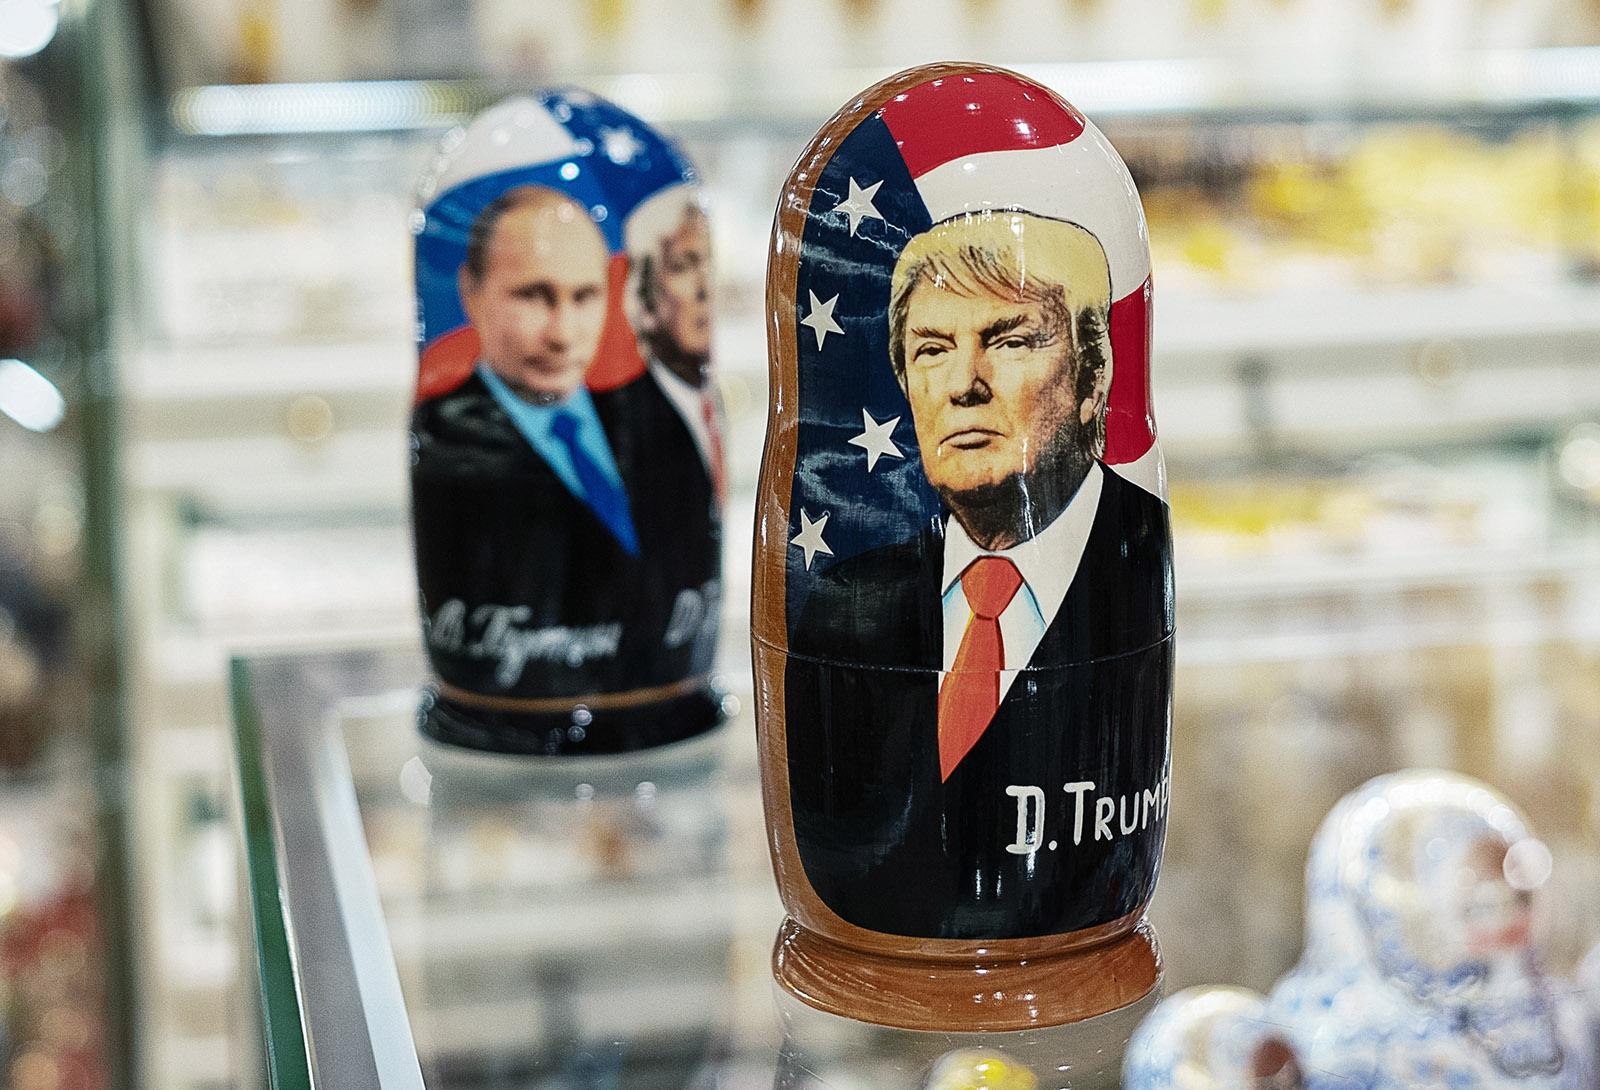 Matryoshka dolls featuring Russian President Vladimir Putin and US President Donald Trump, Moscow, Russia, December 3, 2019